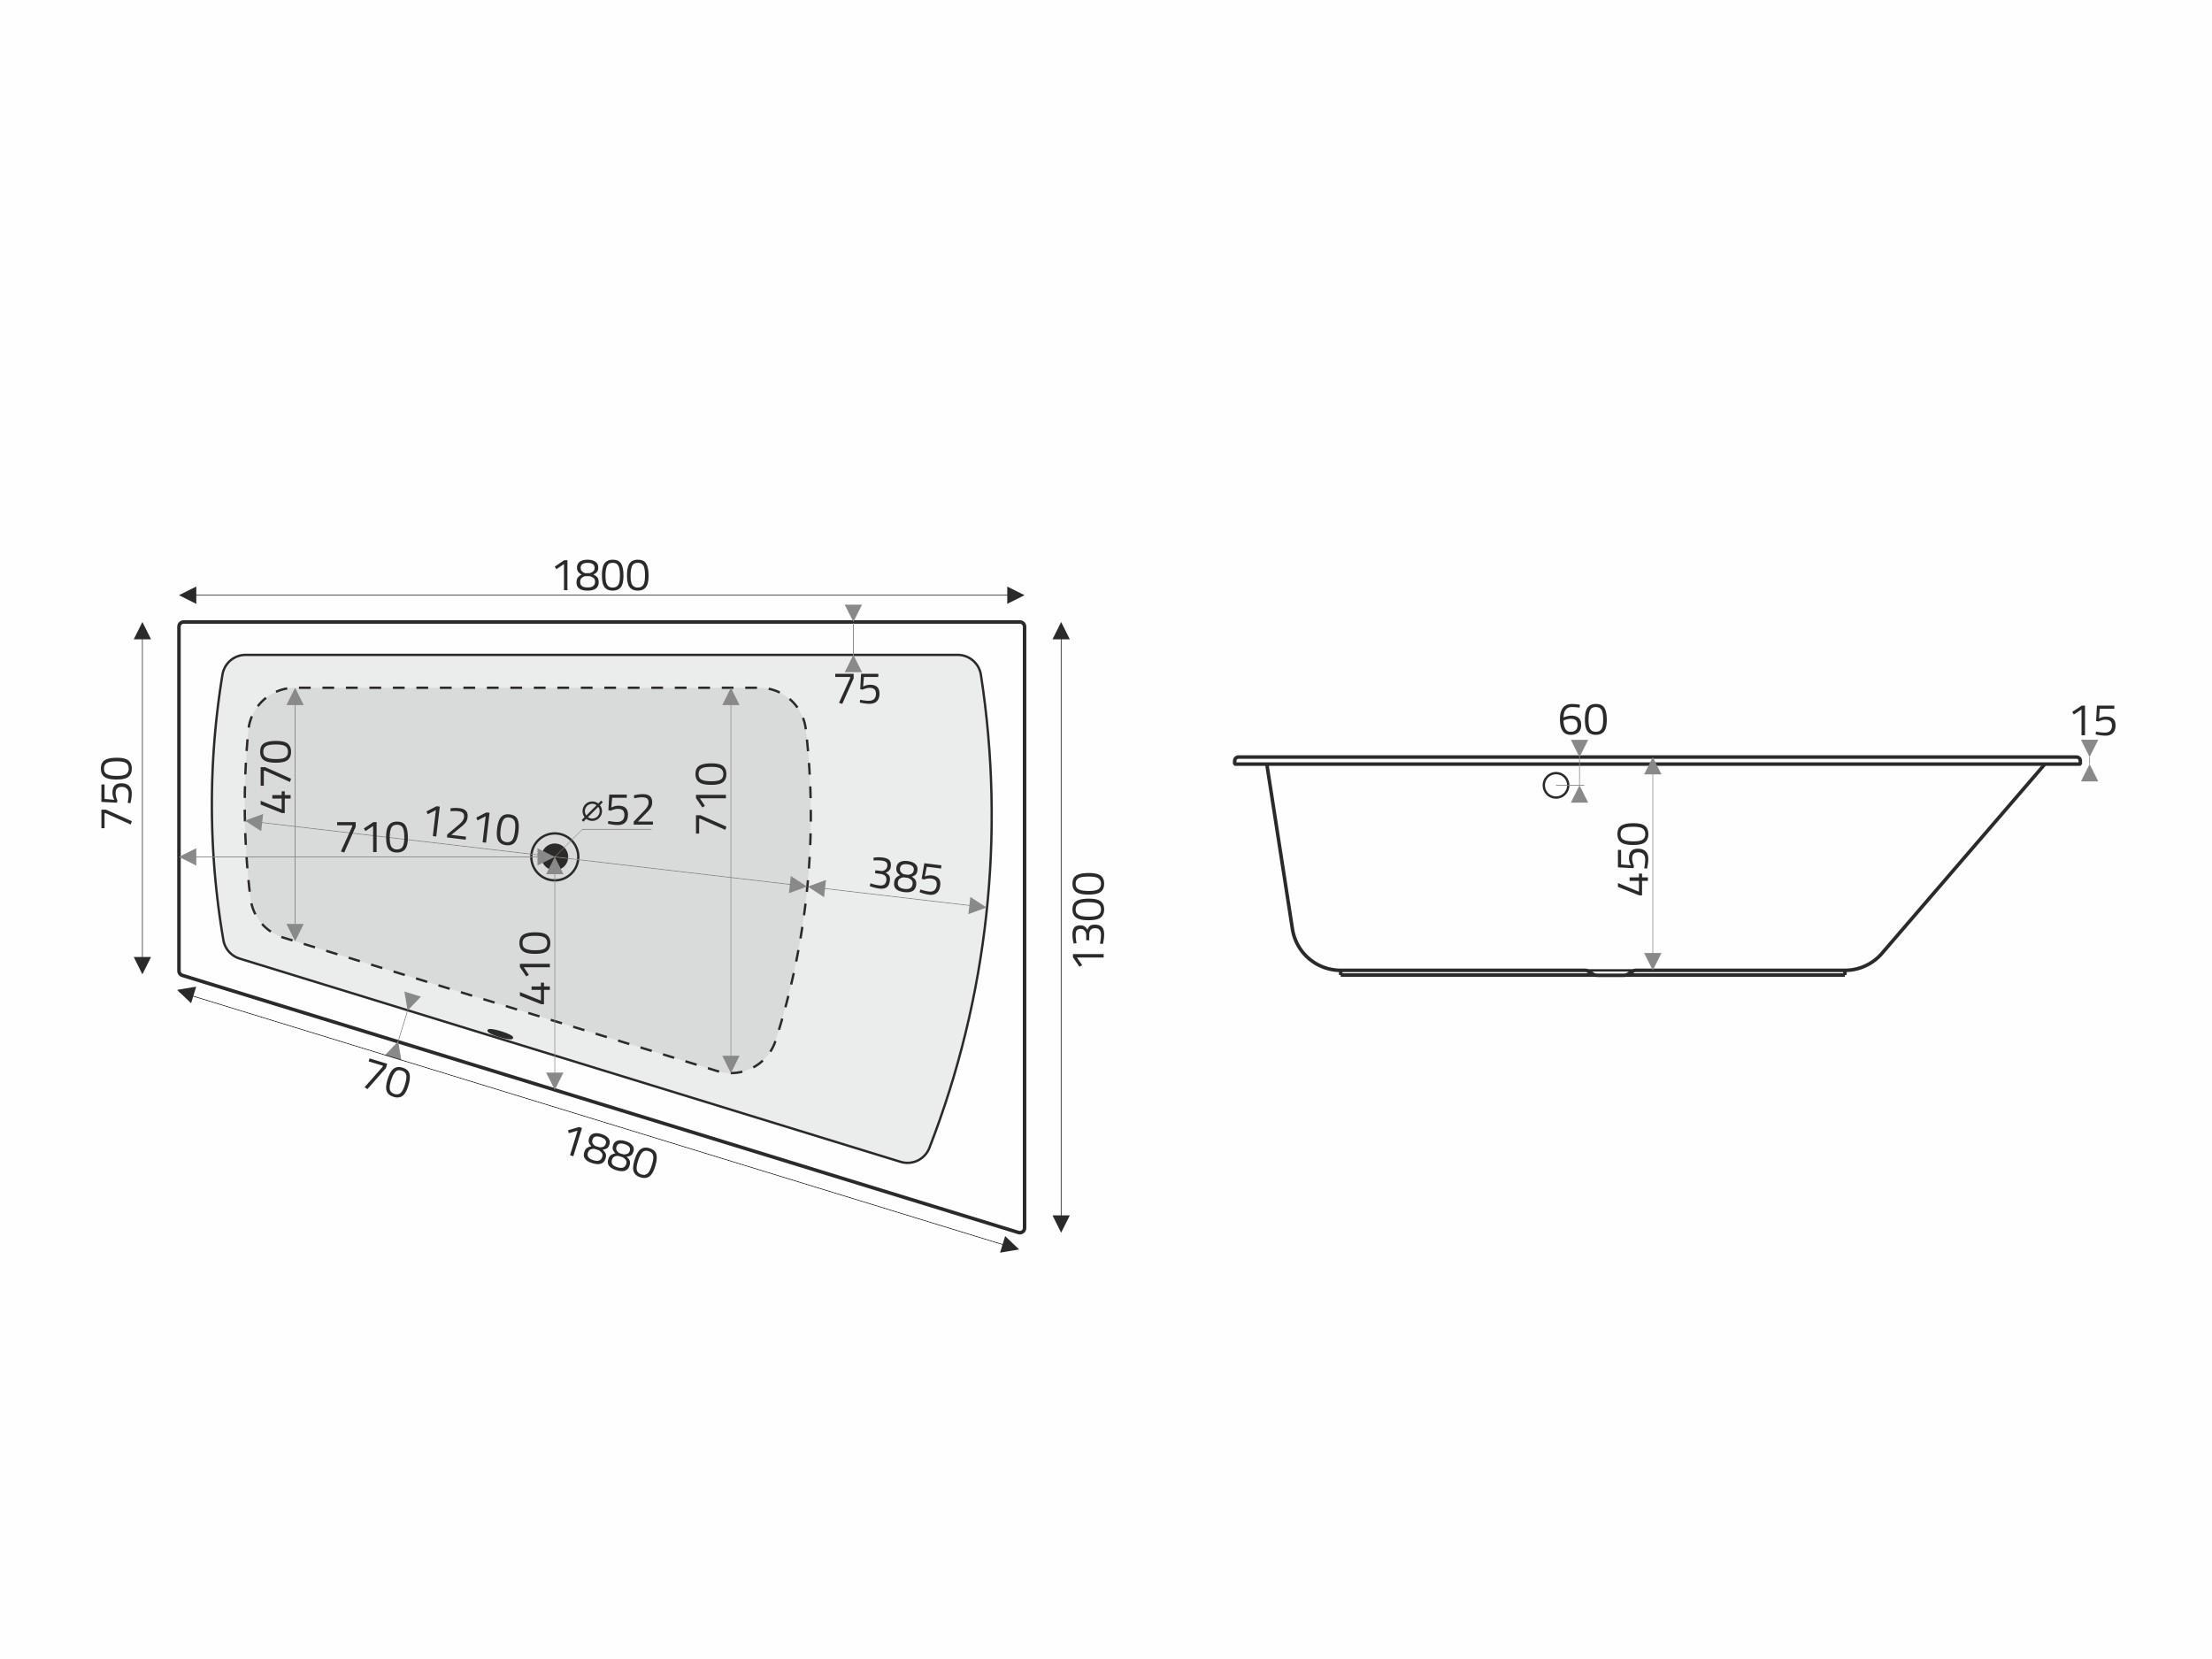 Vita Modular Acryl Trapez Badewanne 180x130 75 Li Cm F Whirlsysteme Weiss Badisto